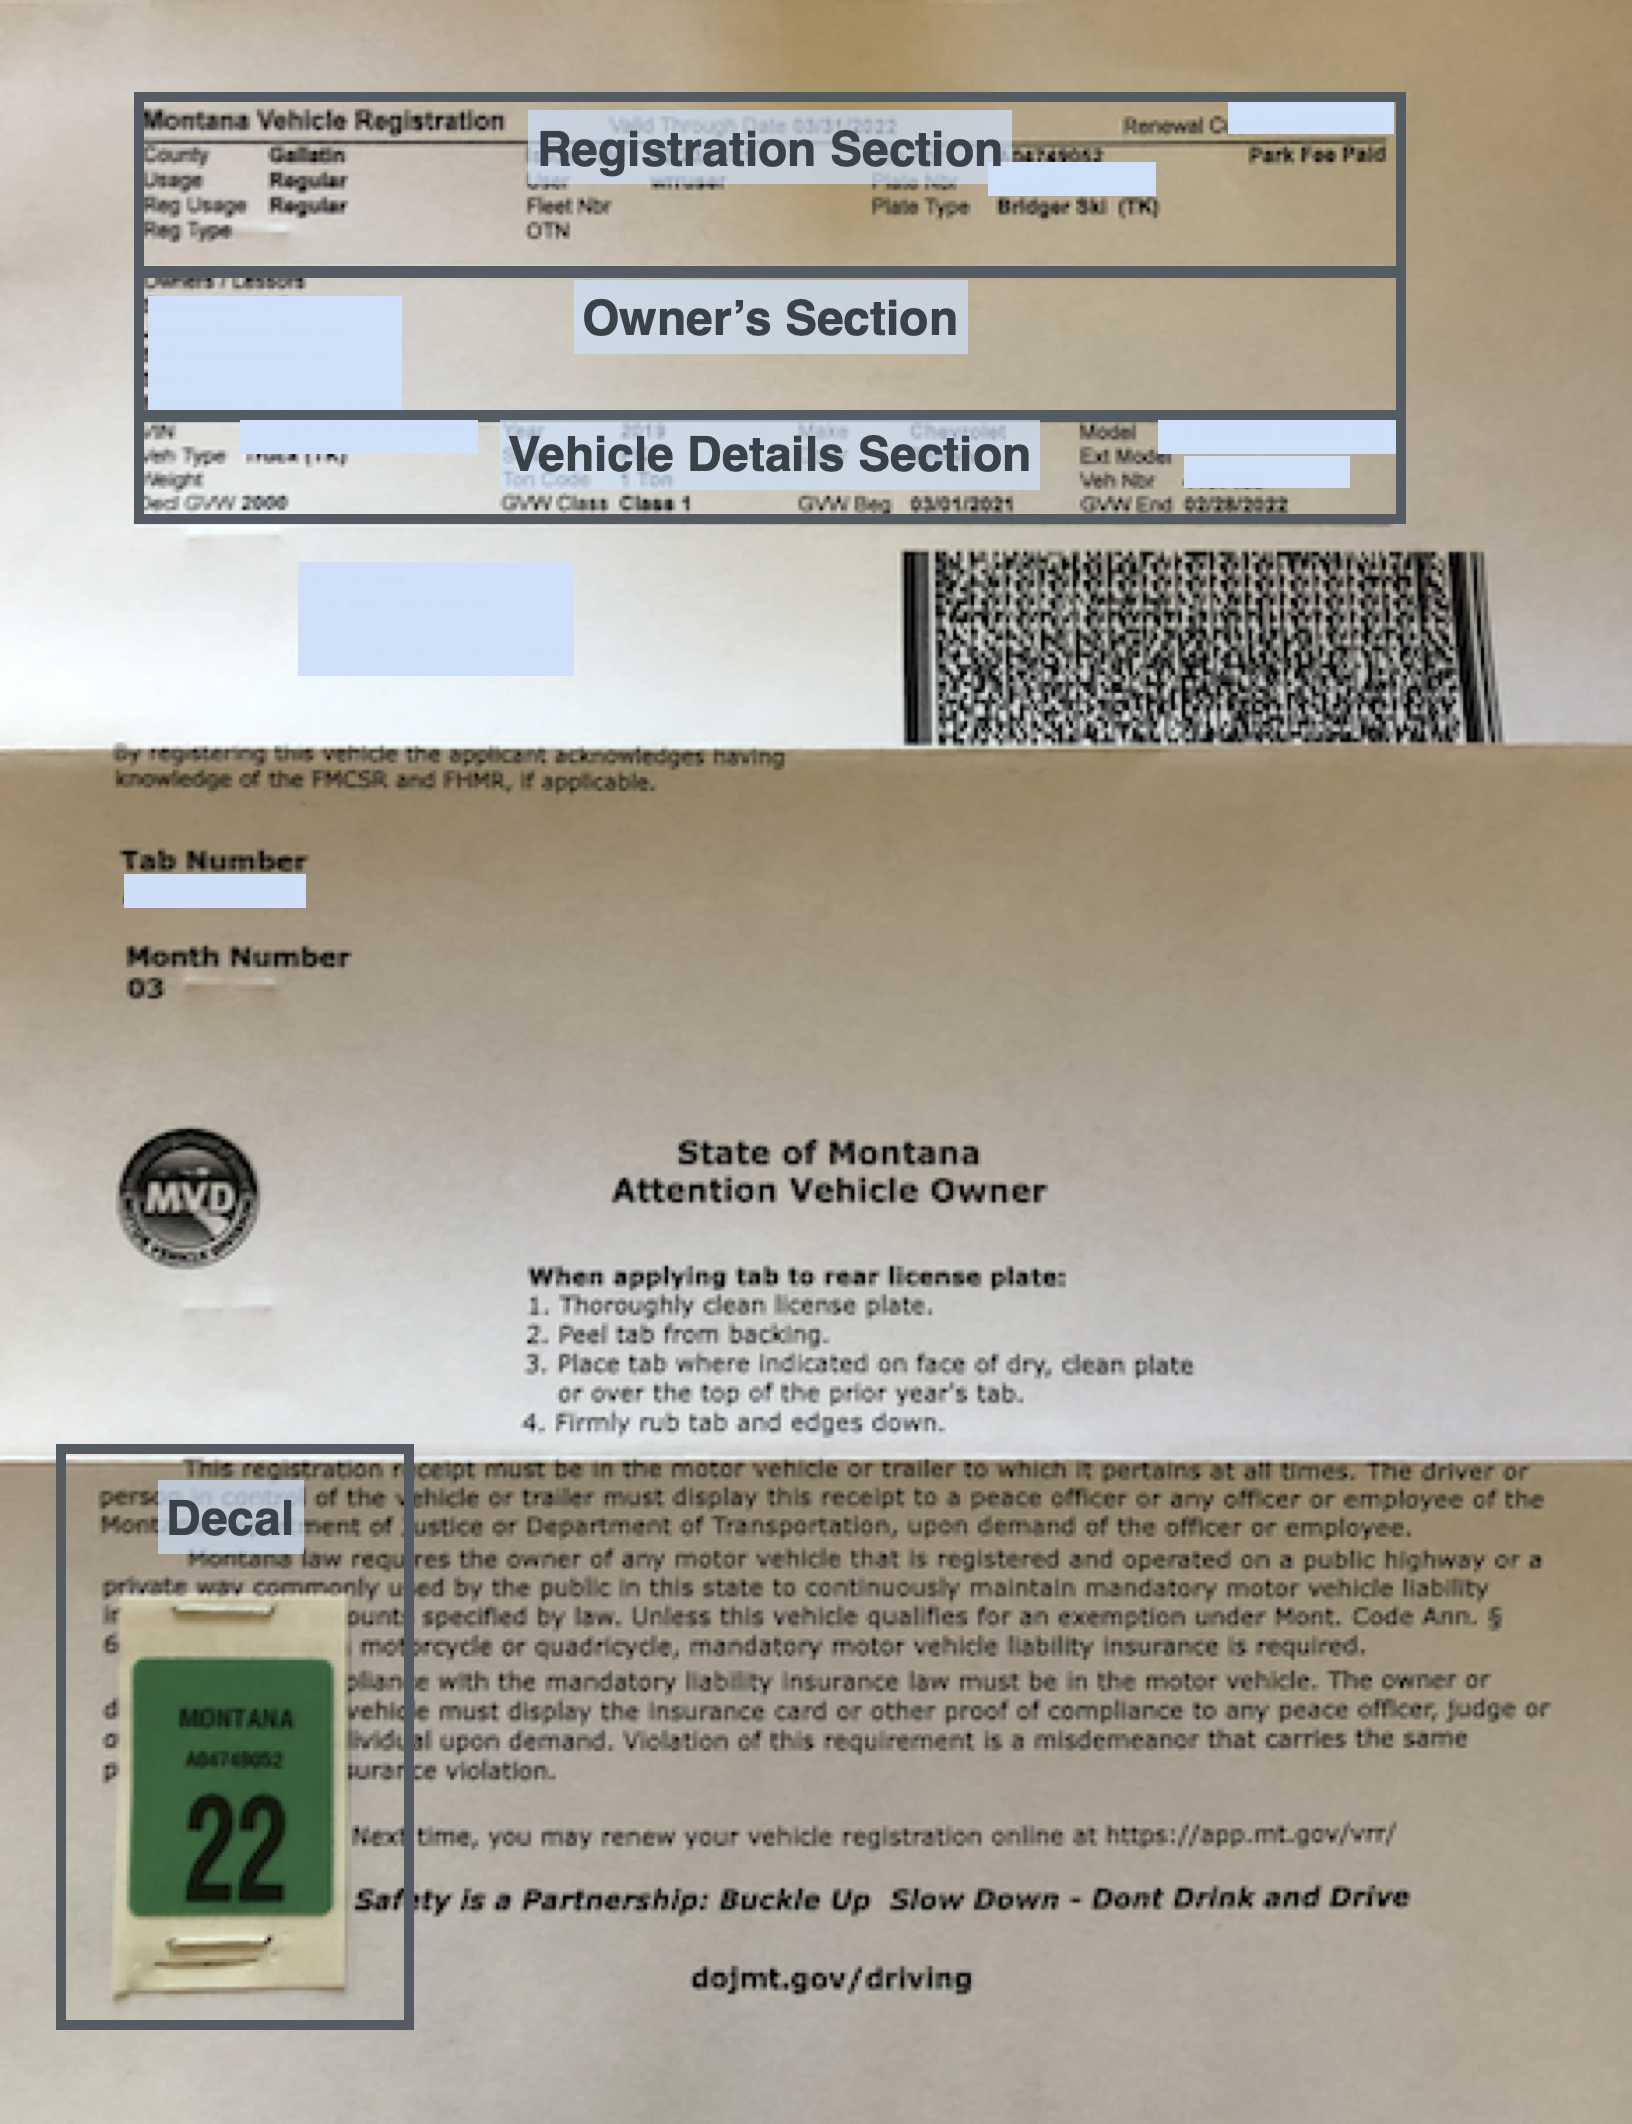 Montana Vehicle Registration Example